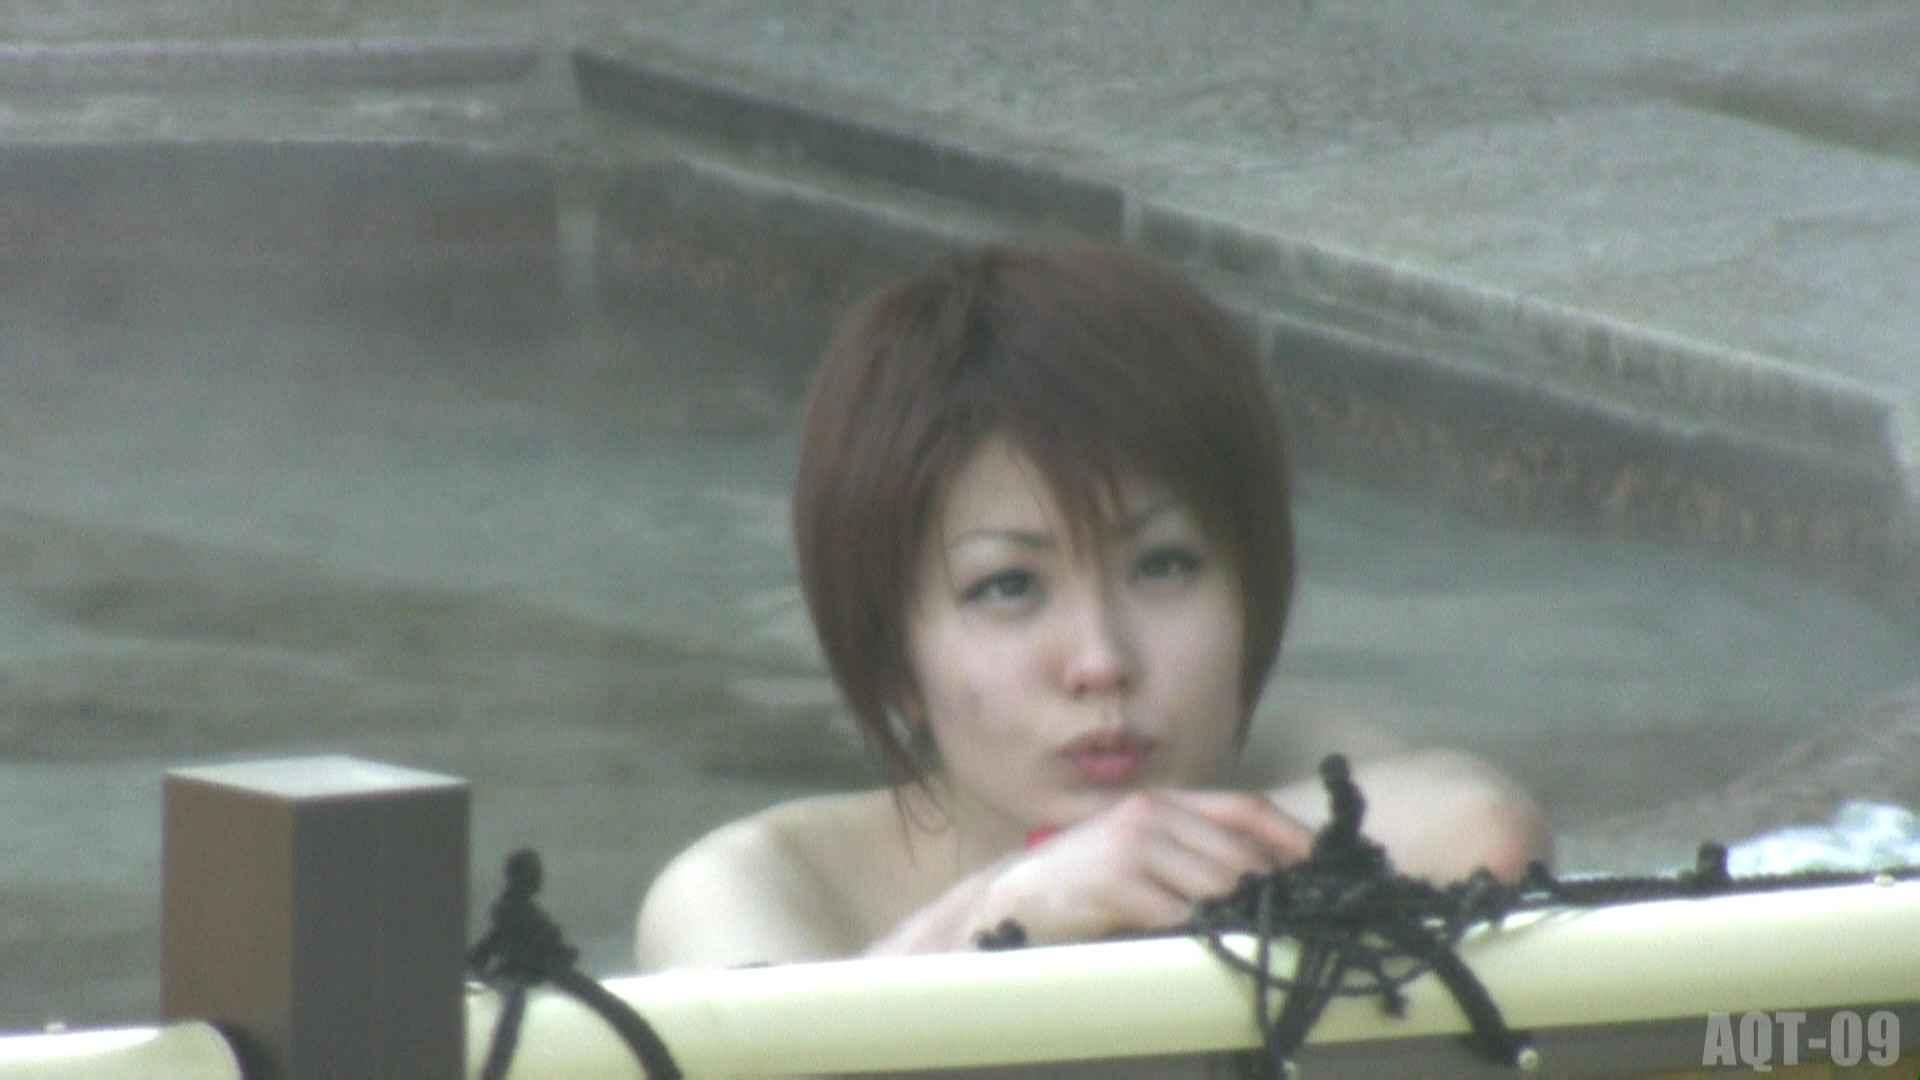 Aquaな露天風呂Vol.779 OLセックス 覗きおまんこ画像 107画像 41